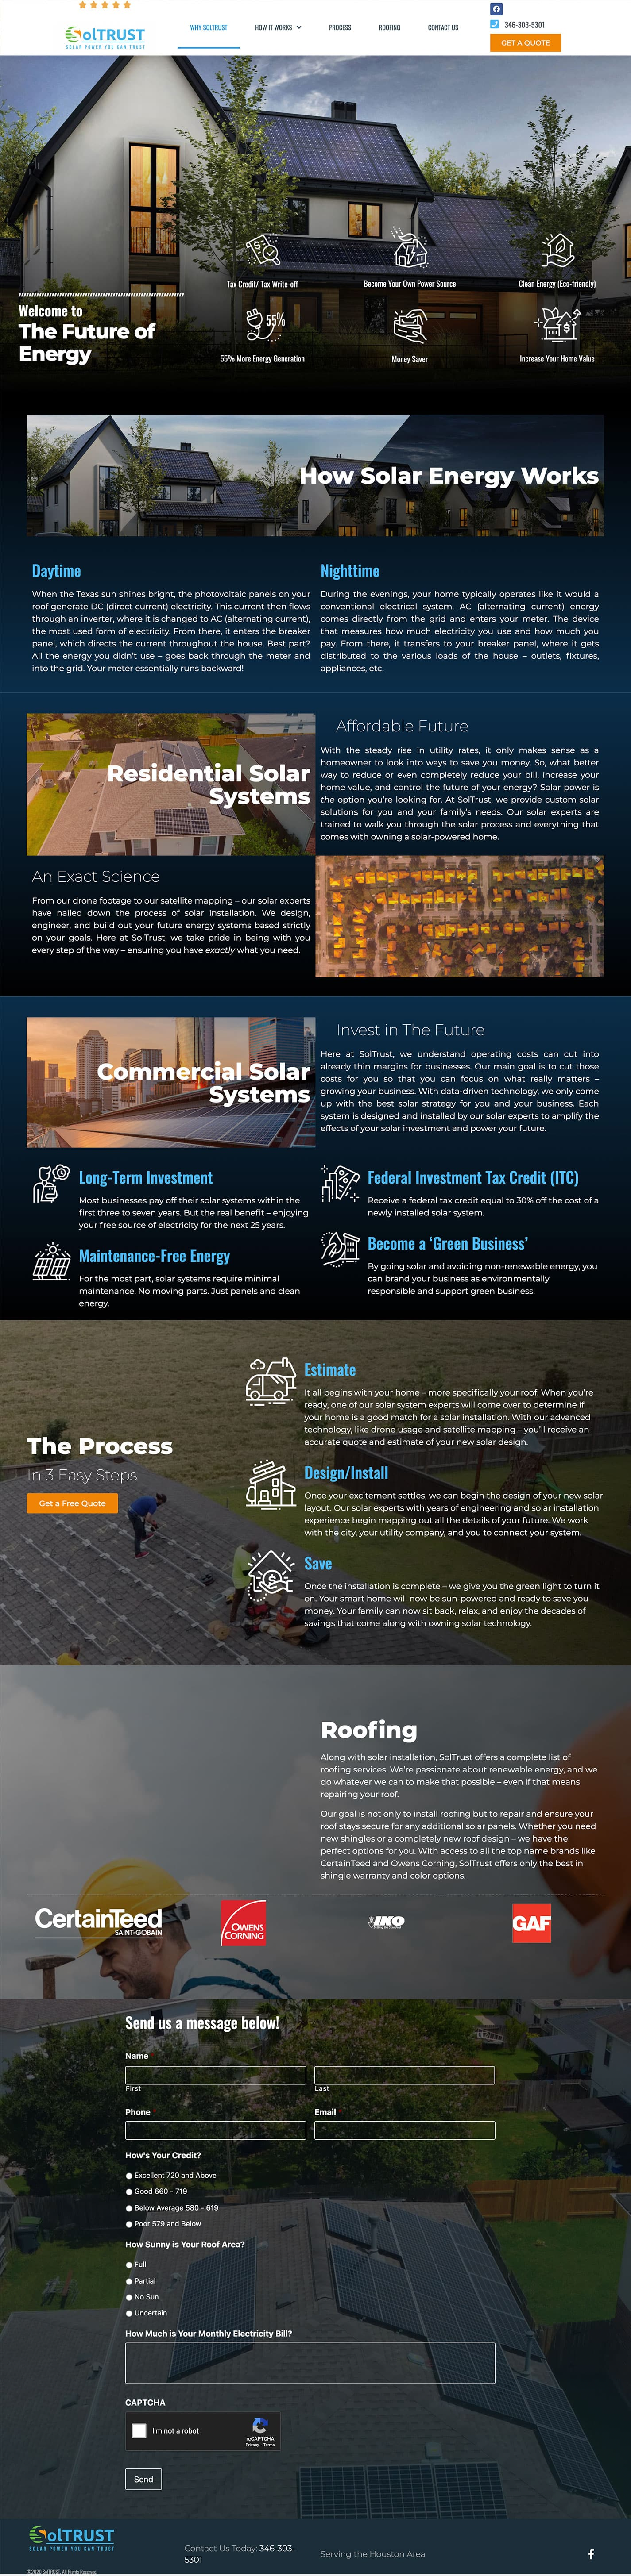 solTRUST-website-design-portfolio-5-IMPROZ-Marketing